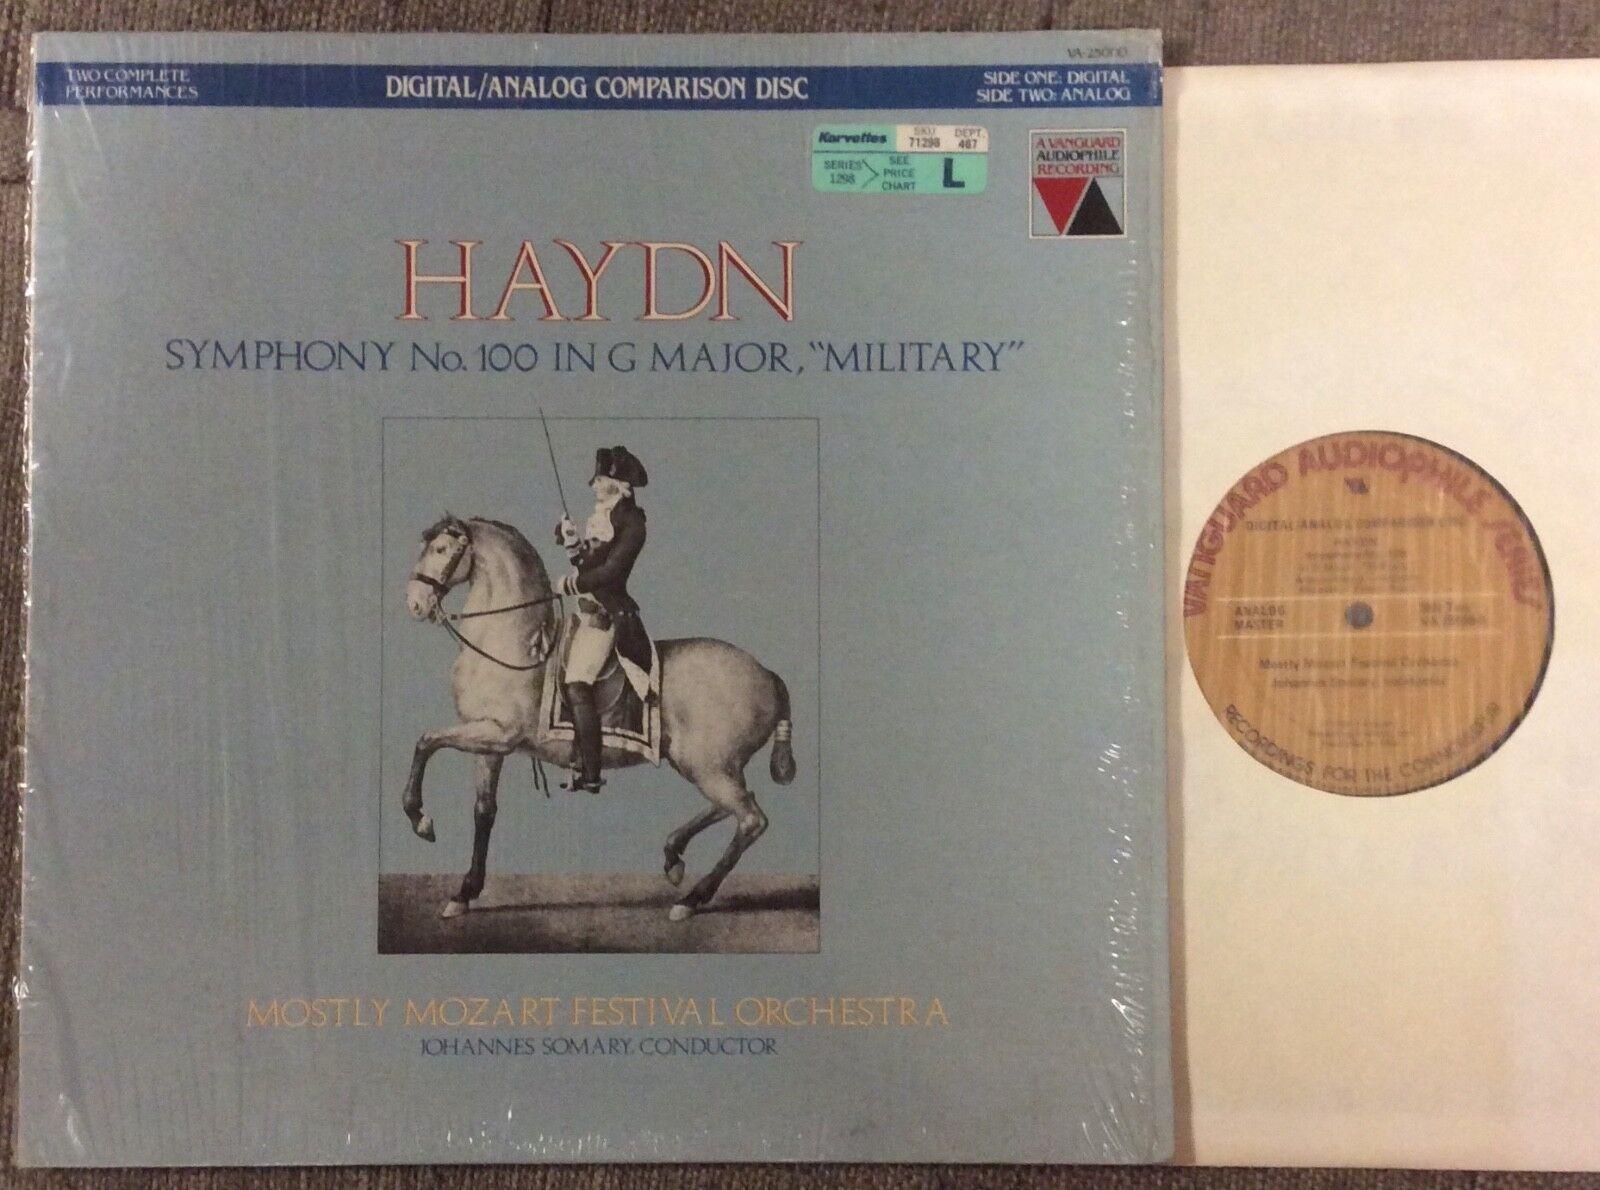 Haydn Symphony No.100, Military , Vanguard Audiophile Recording, Digital/Analog - $5.99